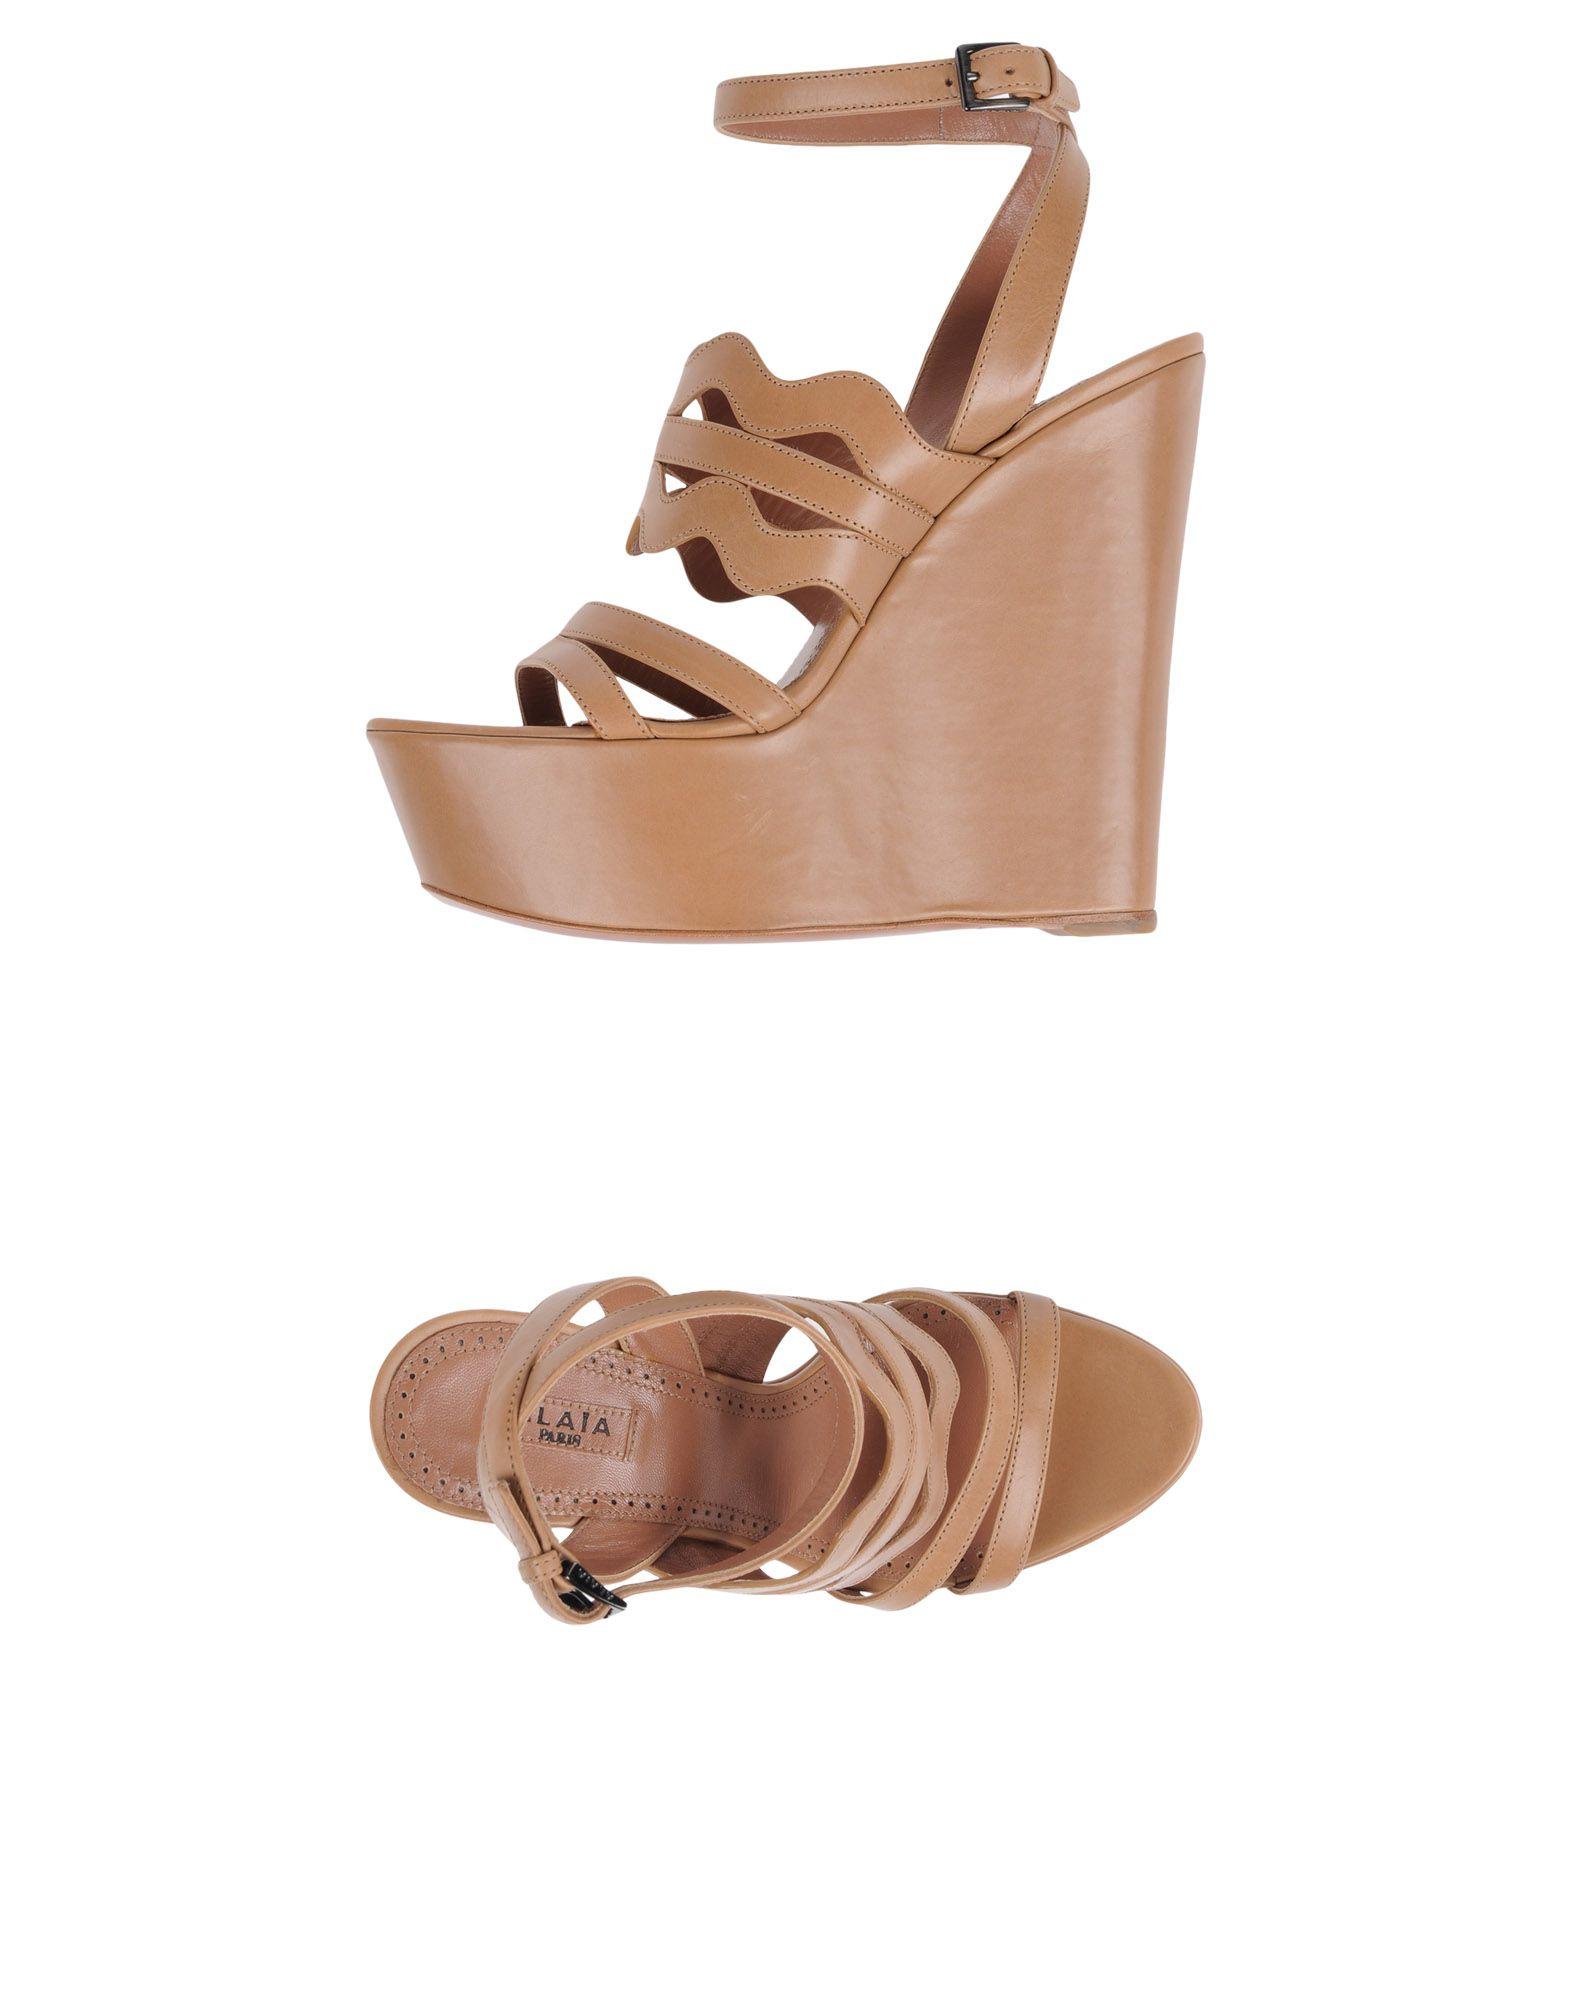 Haltbare Mode billige Schuhe Alaïa Sandalen Damen  11419893BQ Heiße Schuhe